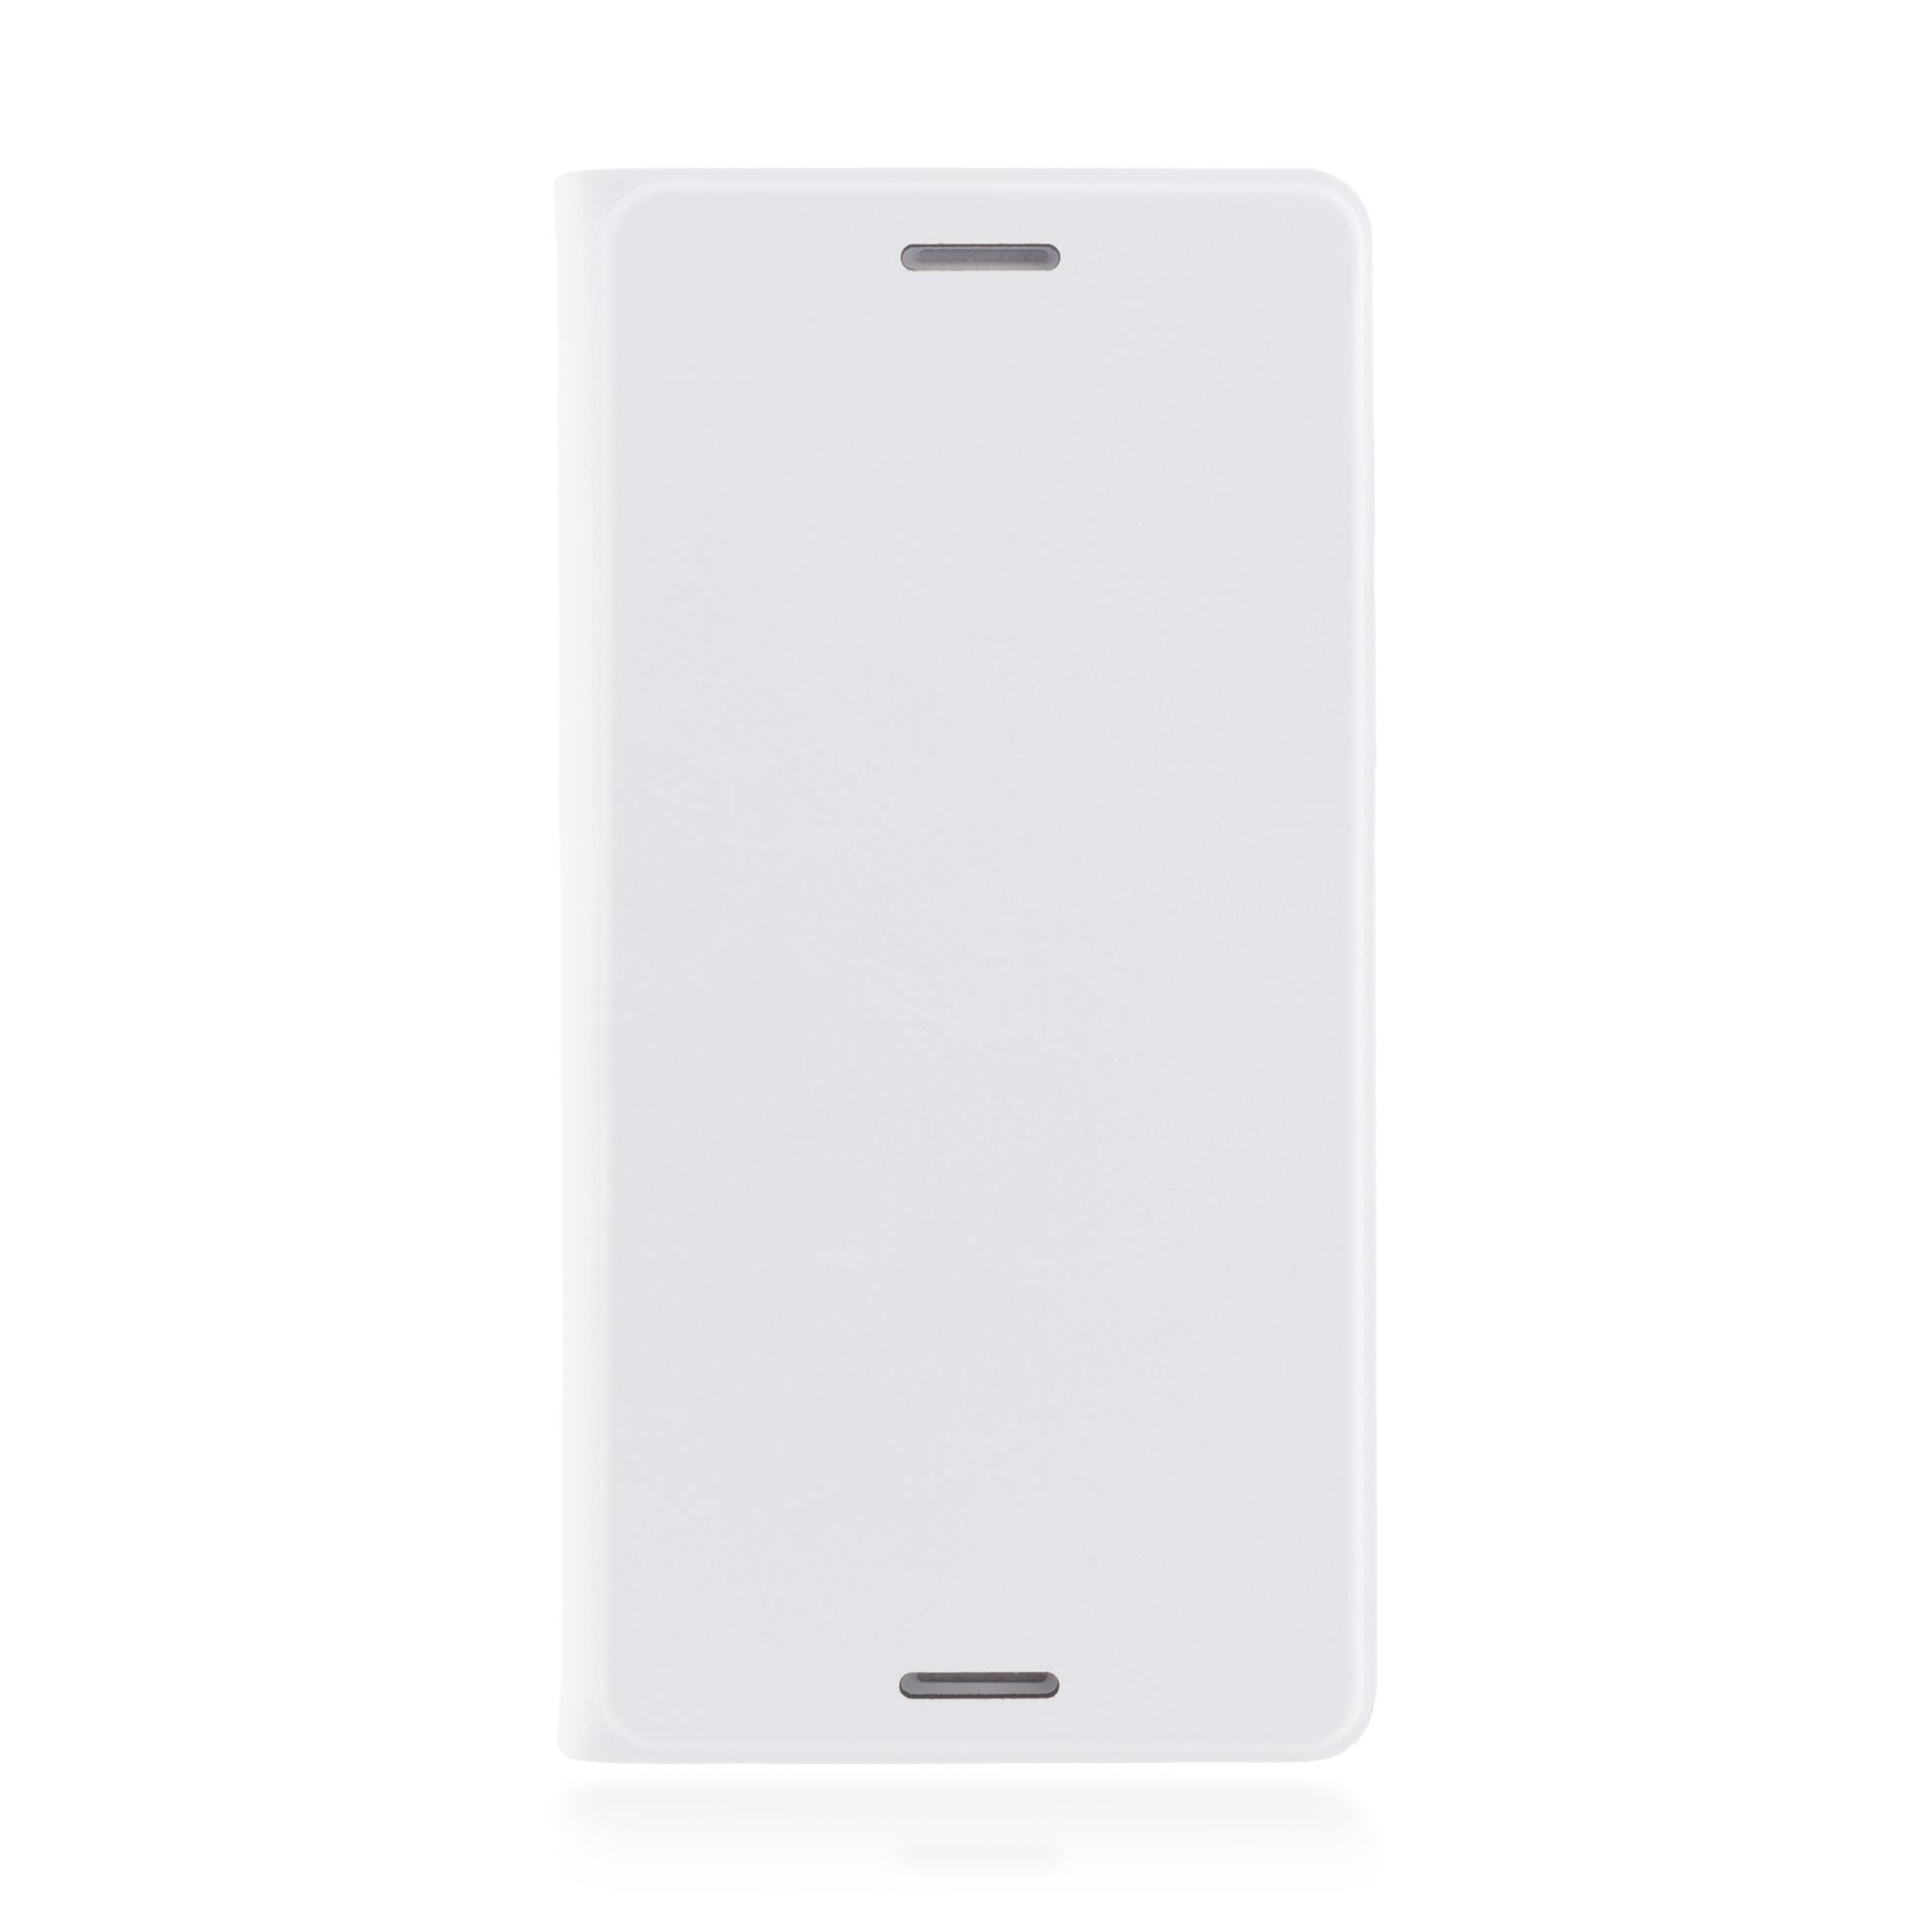 Чехол белый для Xperia X Performance купить в Sony Centre Воронеж